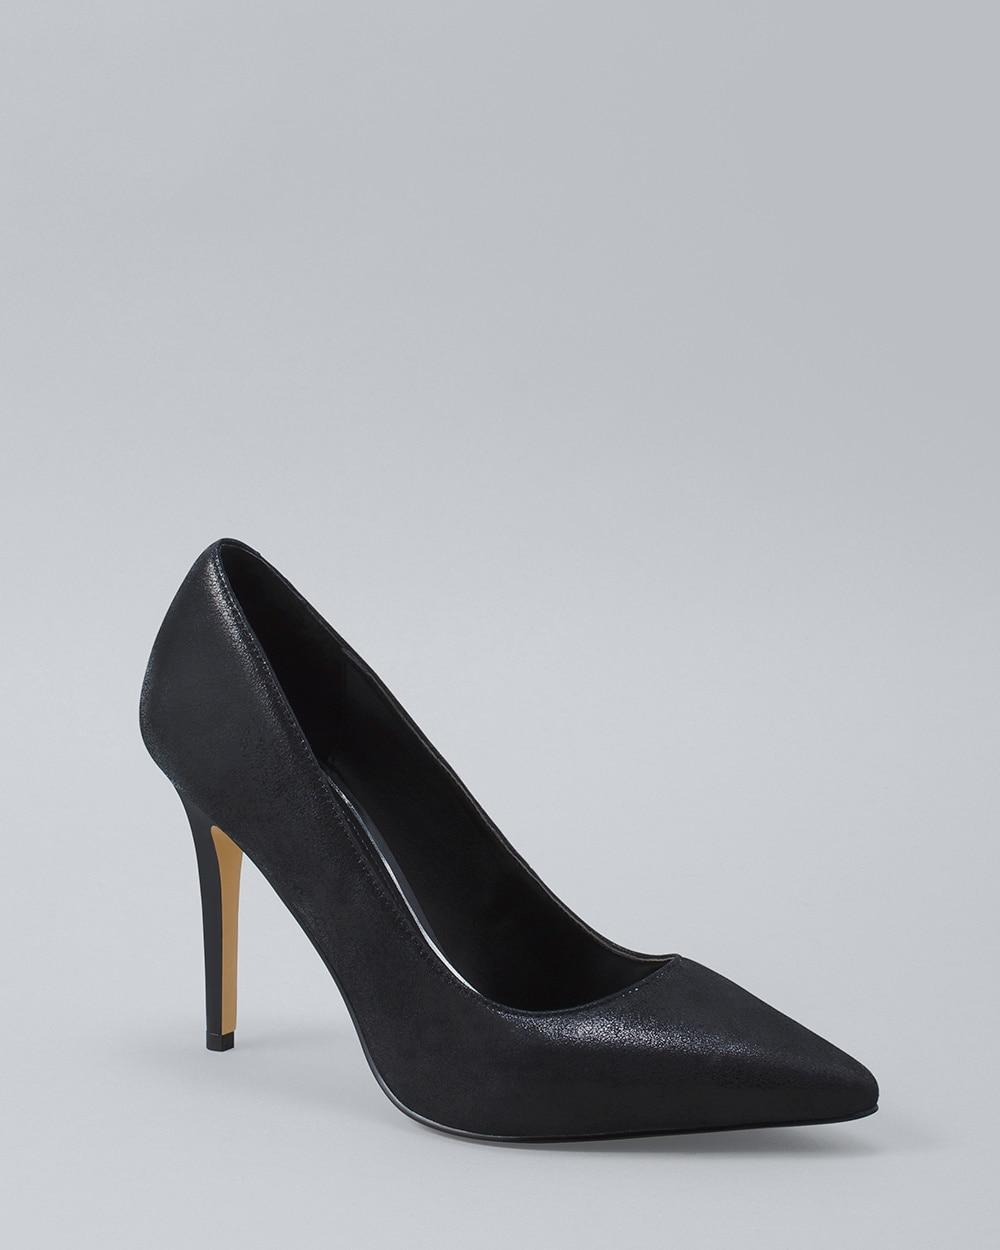 Olivia Suede White House Black Market Shoes